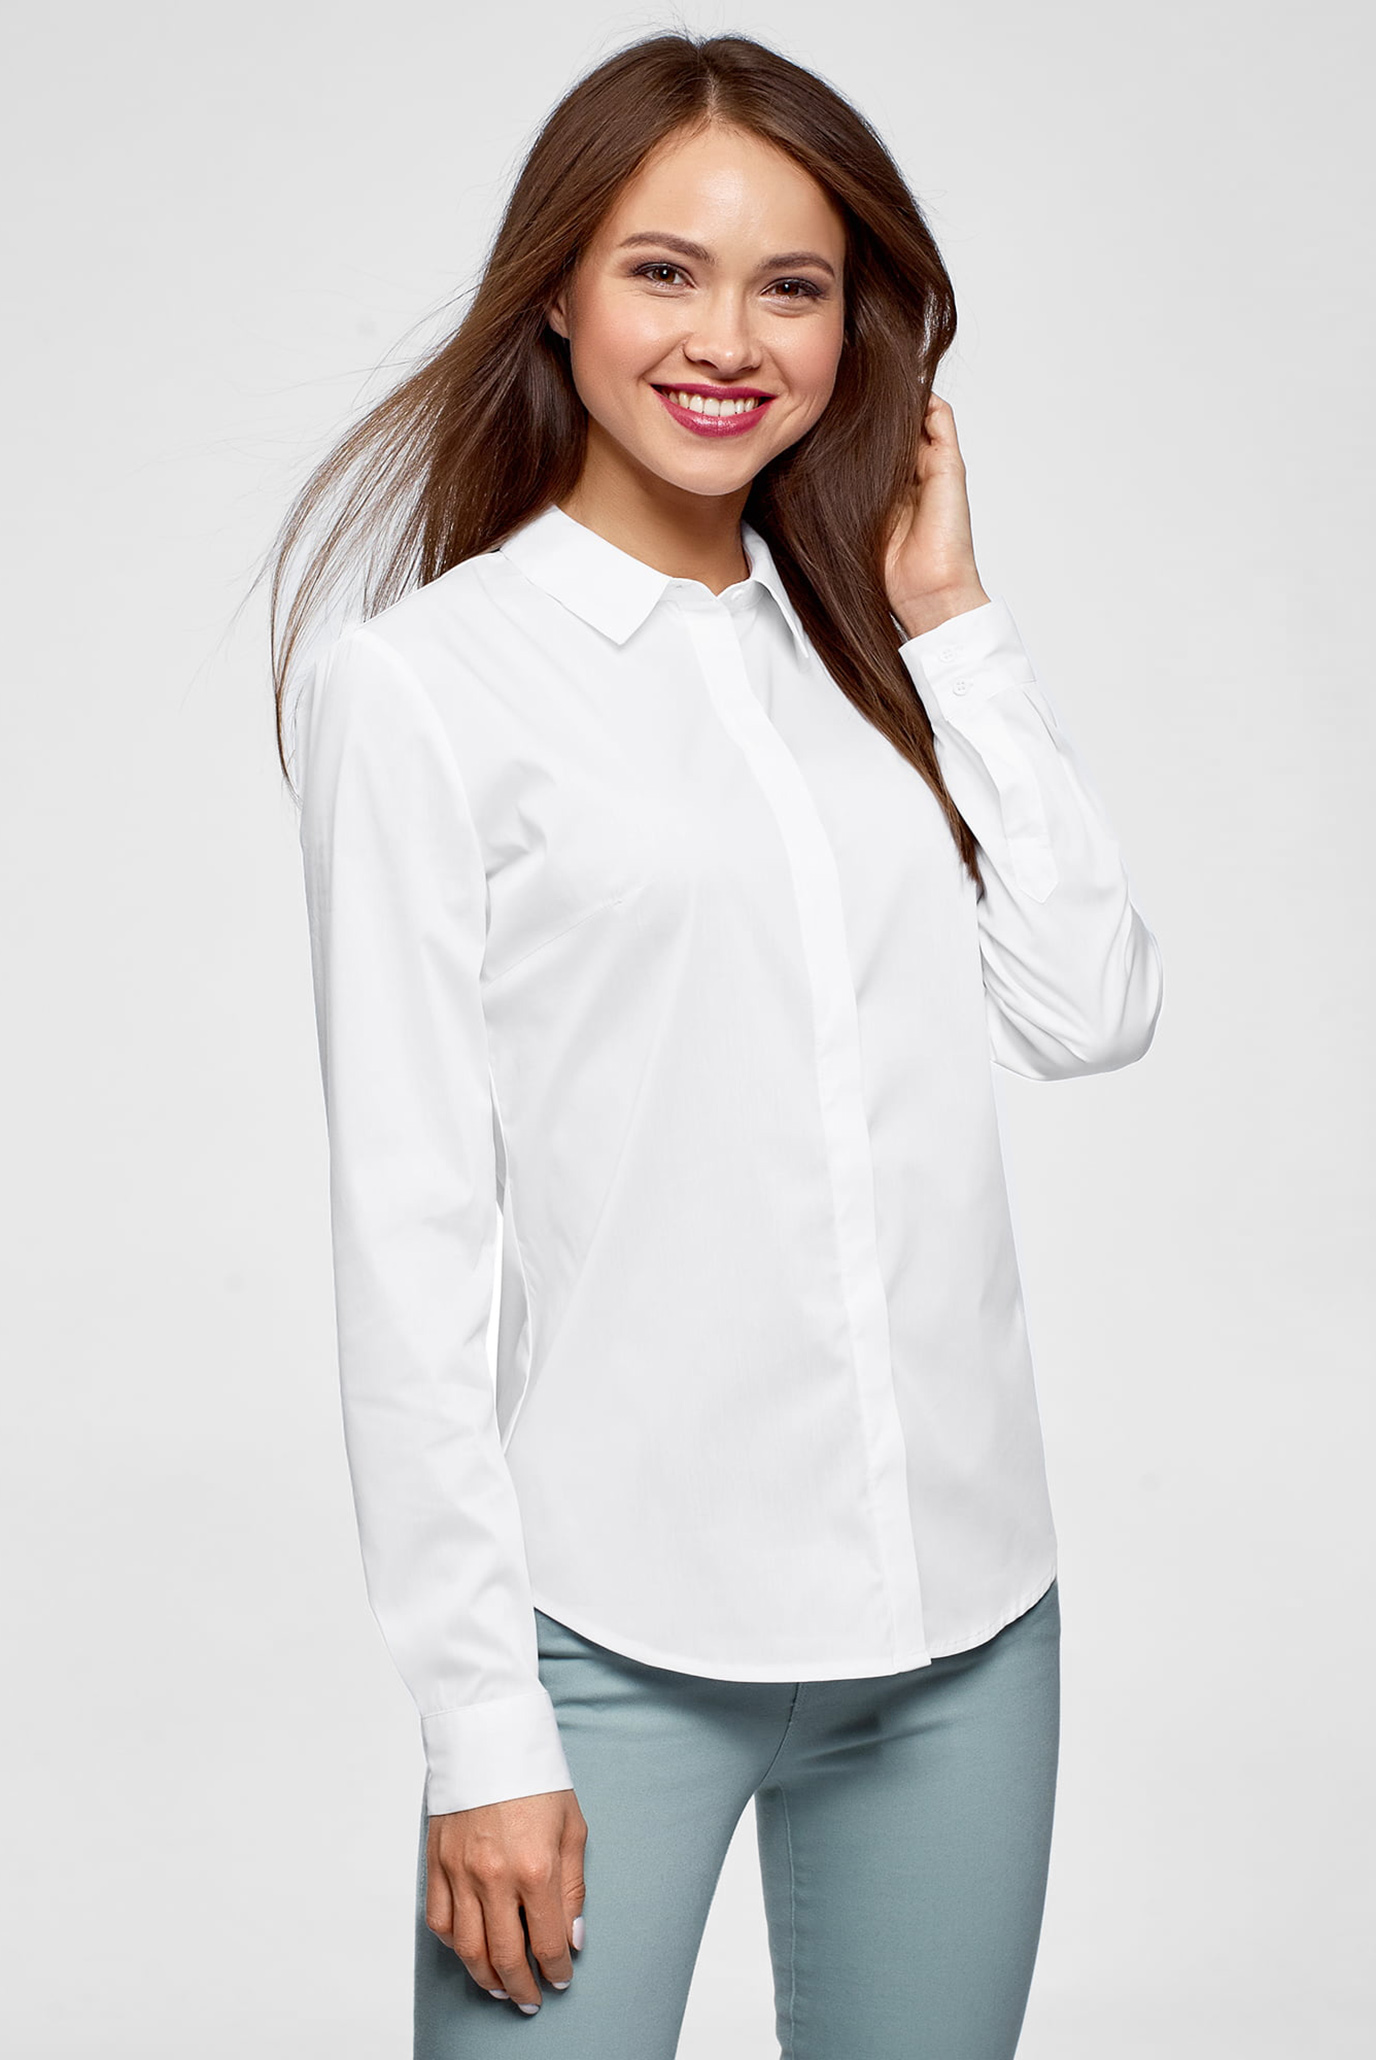 0df05a39d37346e Купить Женская белая рубашка Oodji Oodji 13K03003B/42083/1000N – Киев,  Украина. Цены в интернет магазине MD Fashion